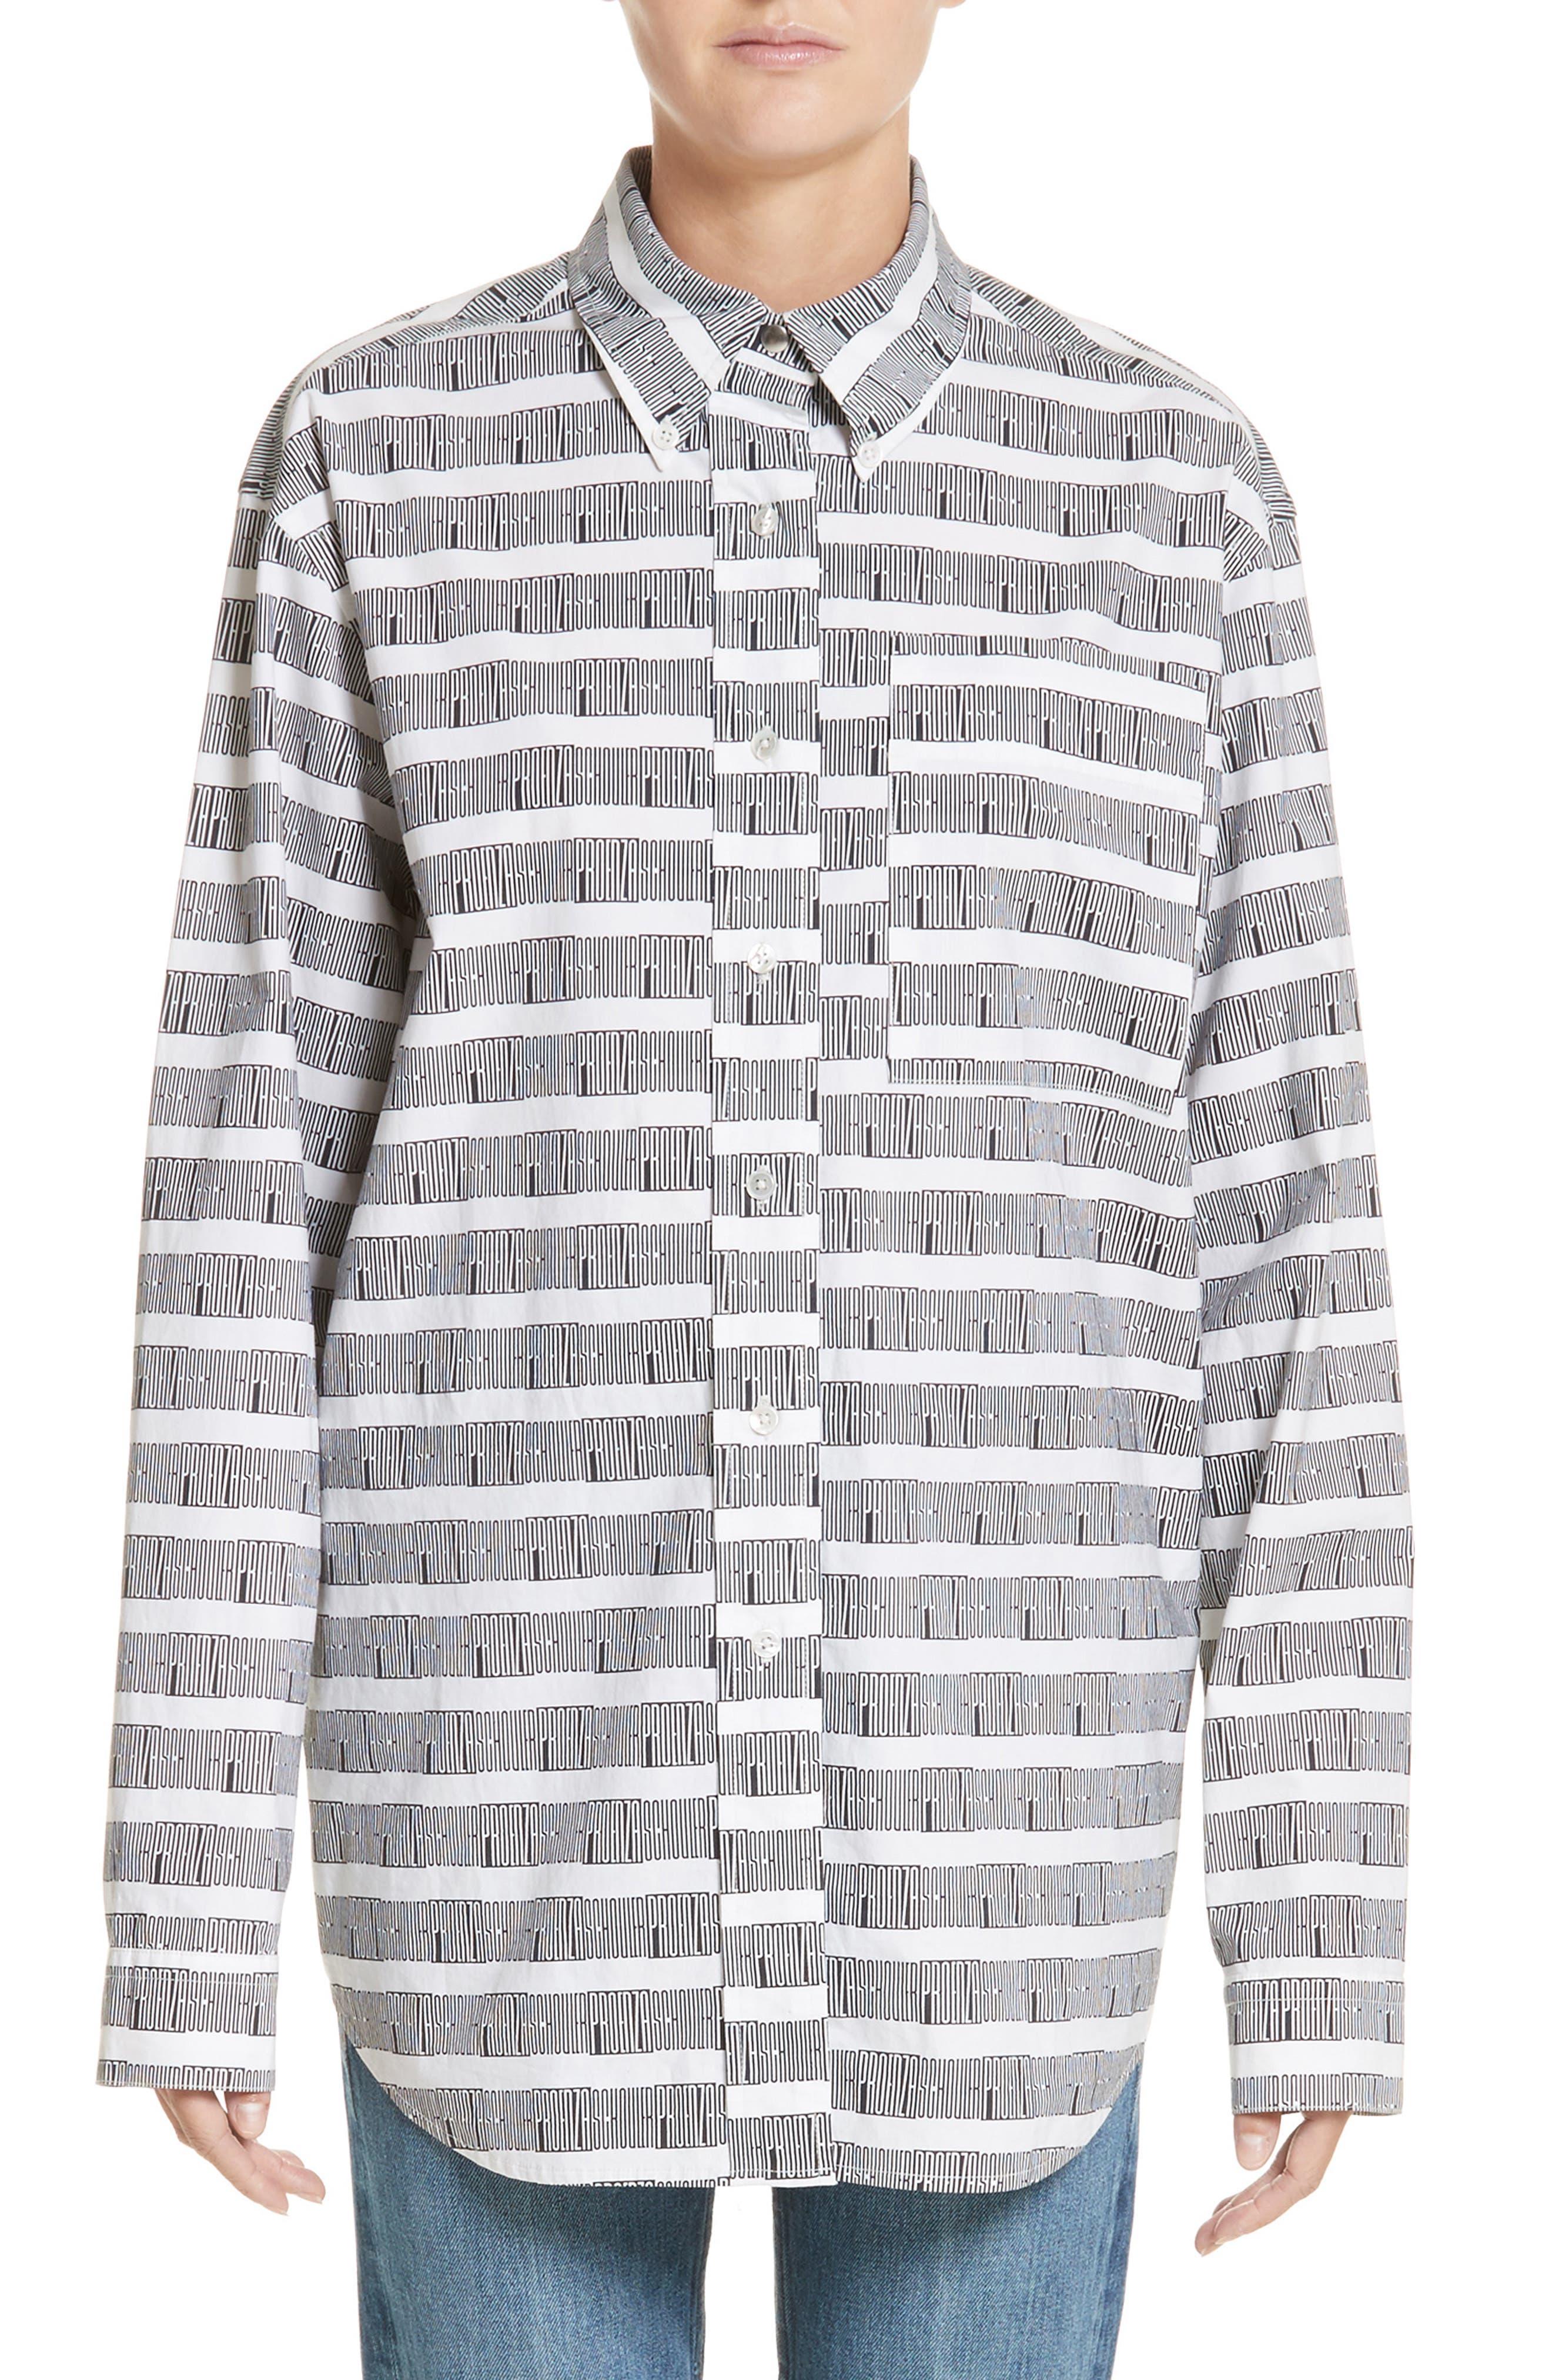 PSWL Graphic Stripe Cotton Top,                         Main,                         color, 001